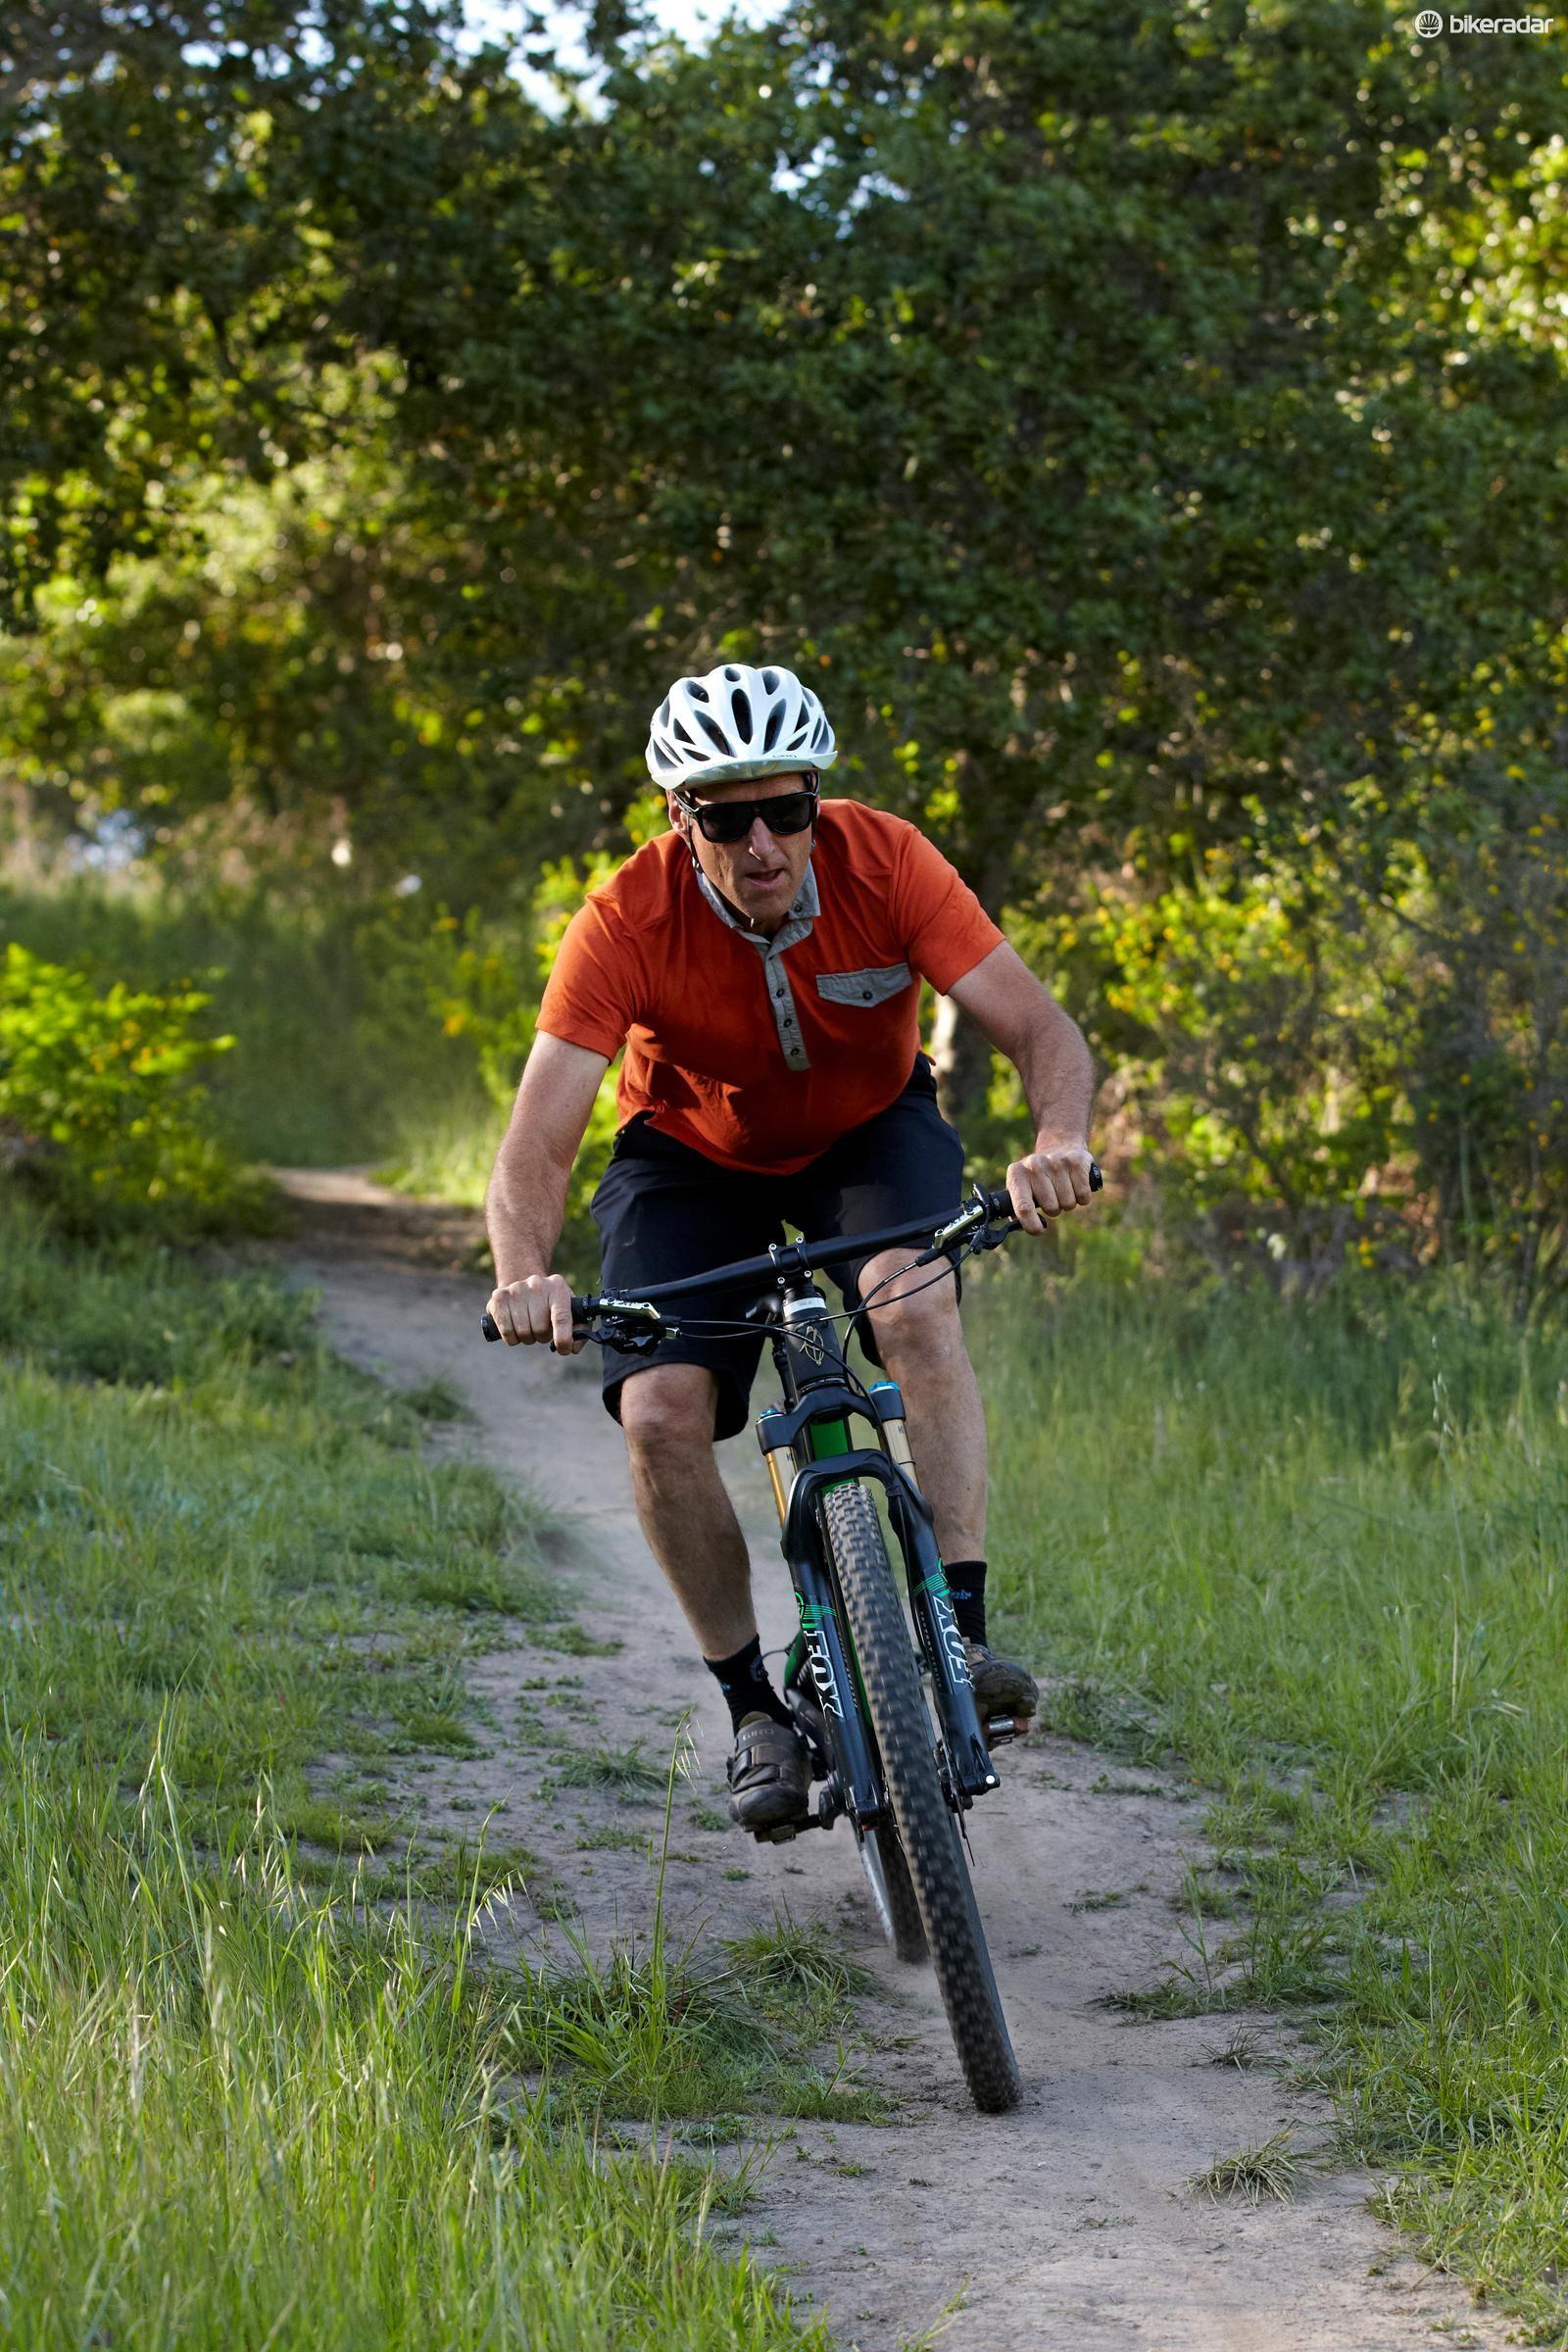 Nicol shows us around his local trails